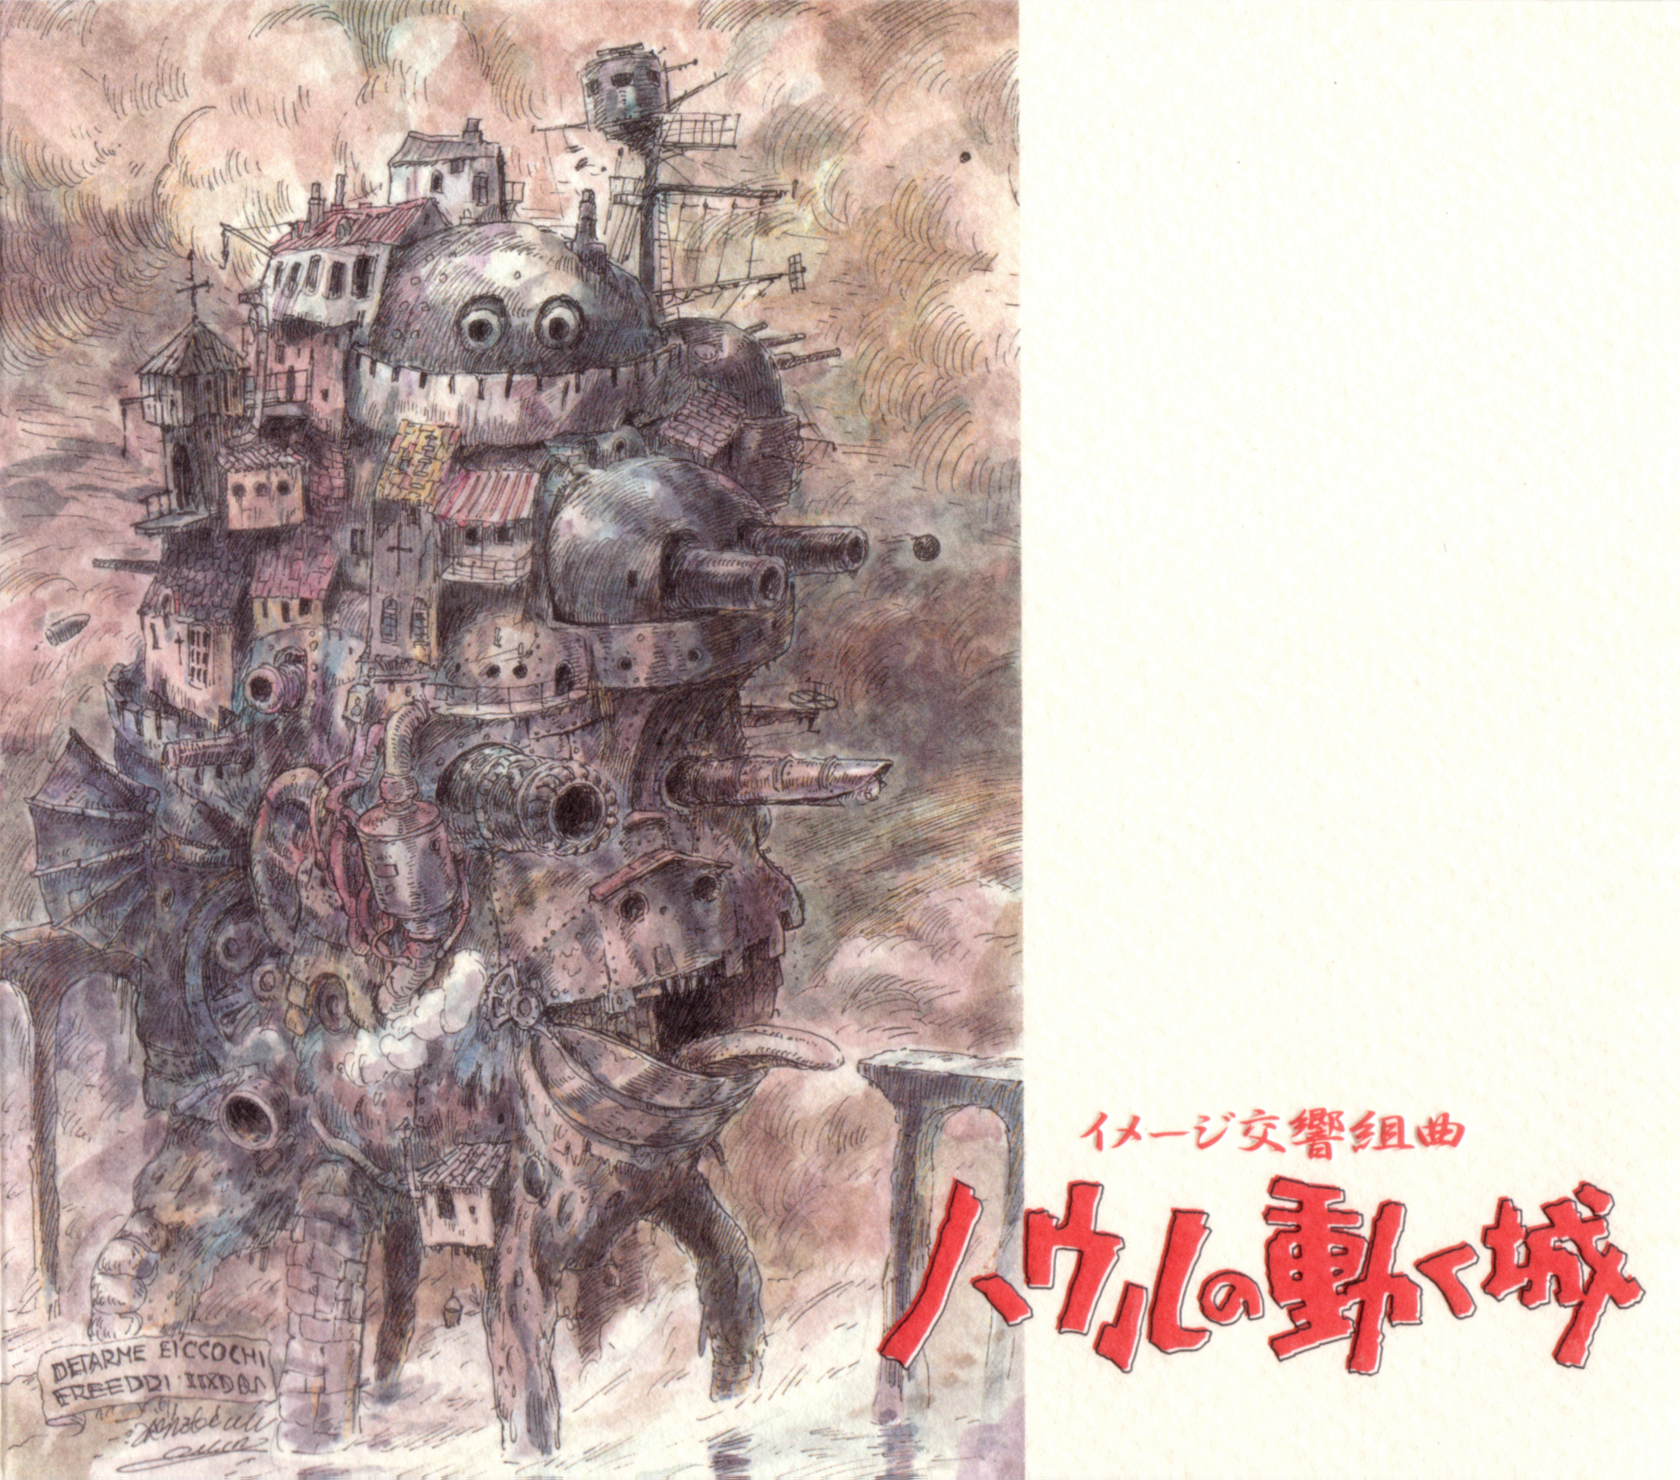 Image Symphonic Suite Howl's Moving Castle Slipcase Front.png